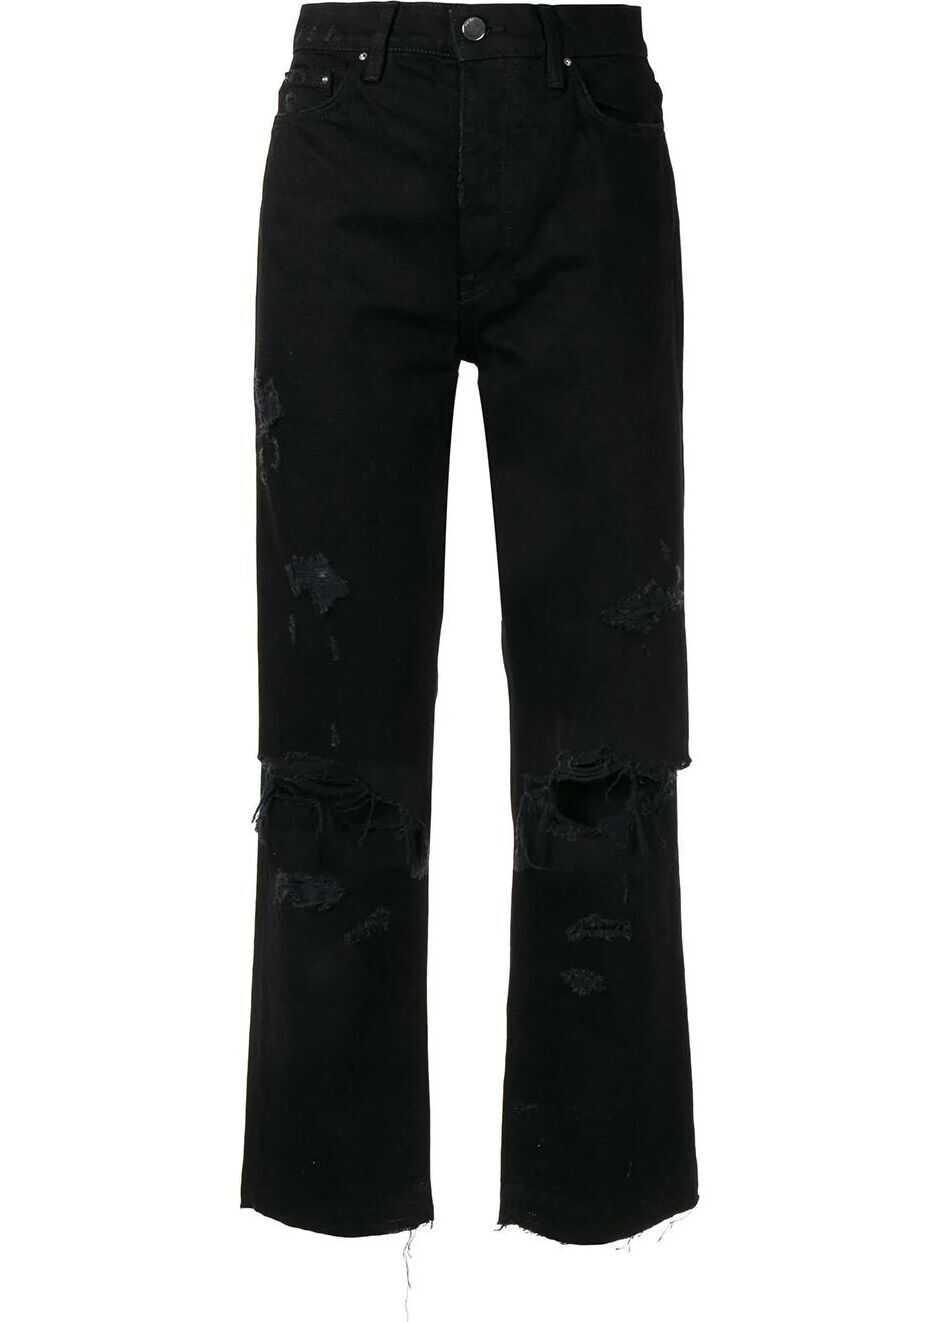 AMIRI Cotton Jeans BLACK